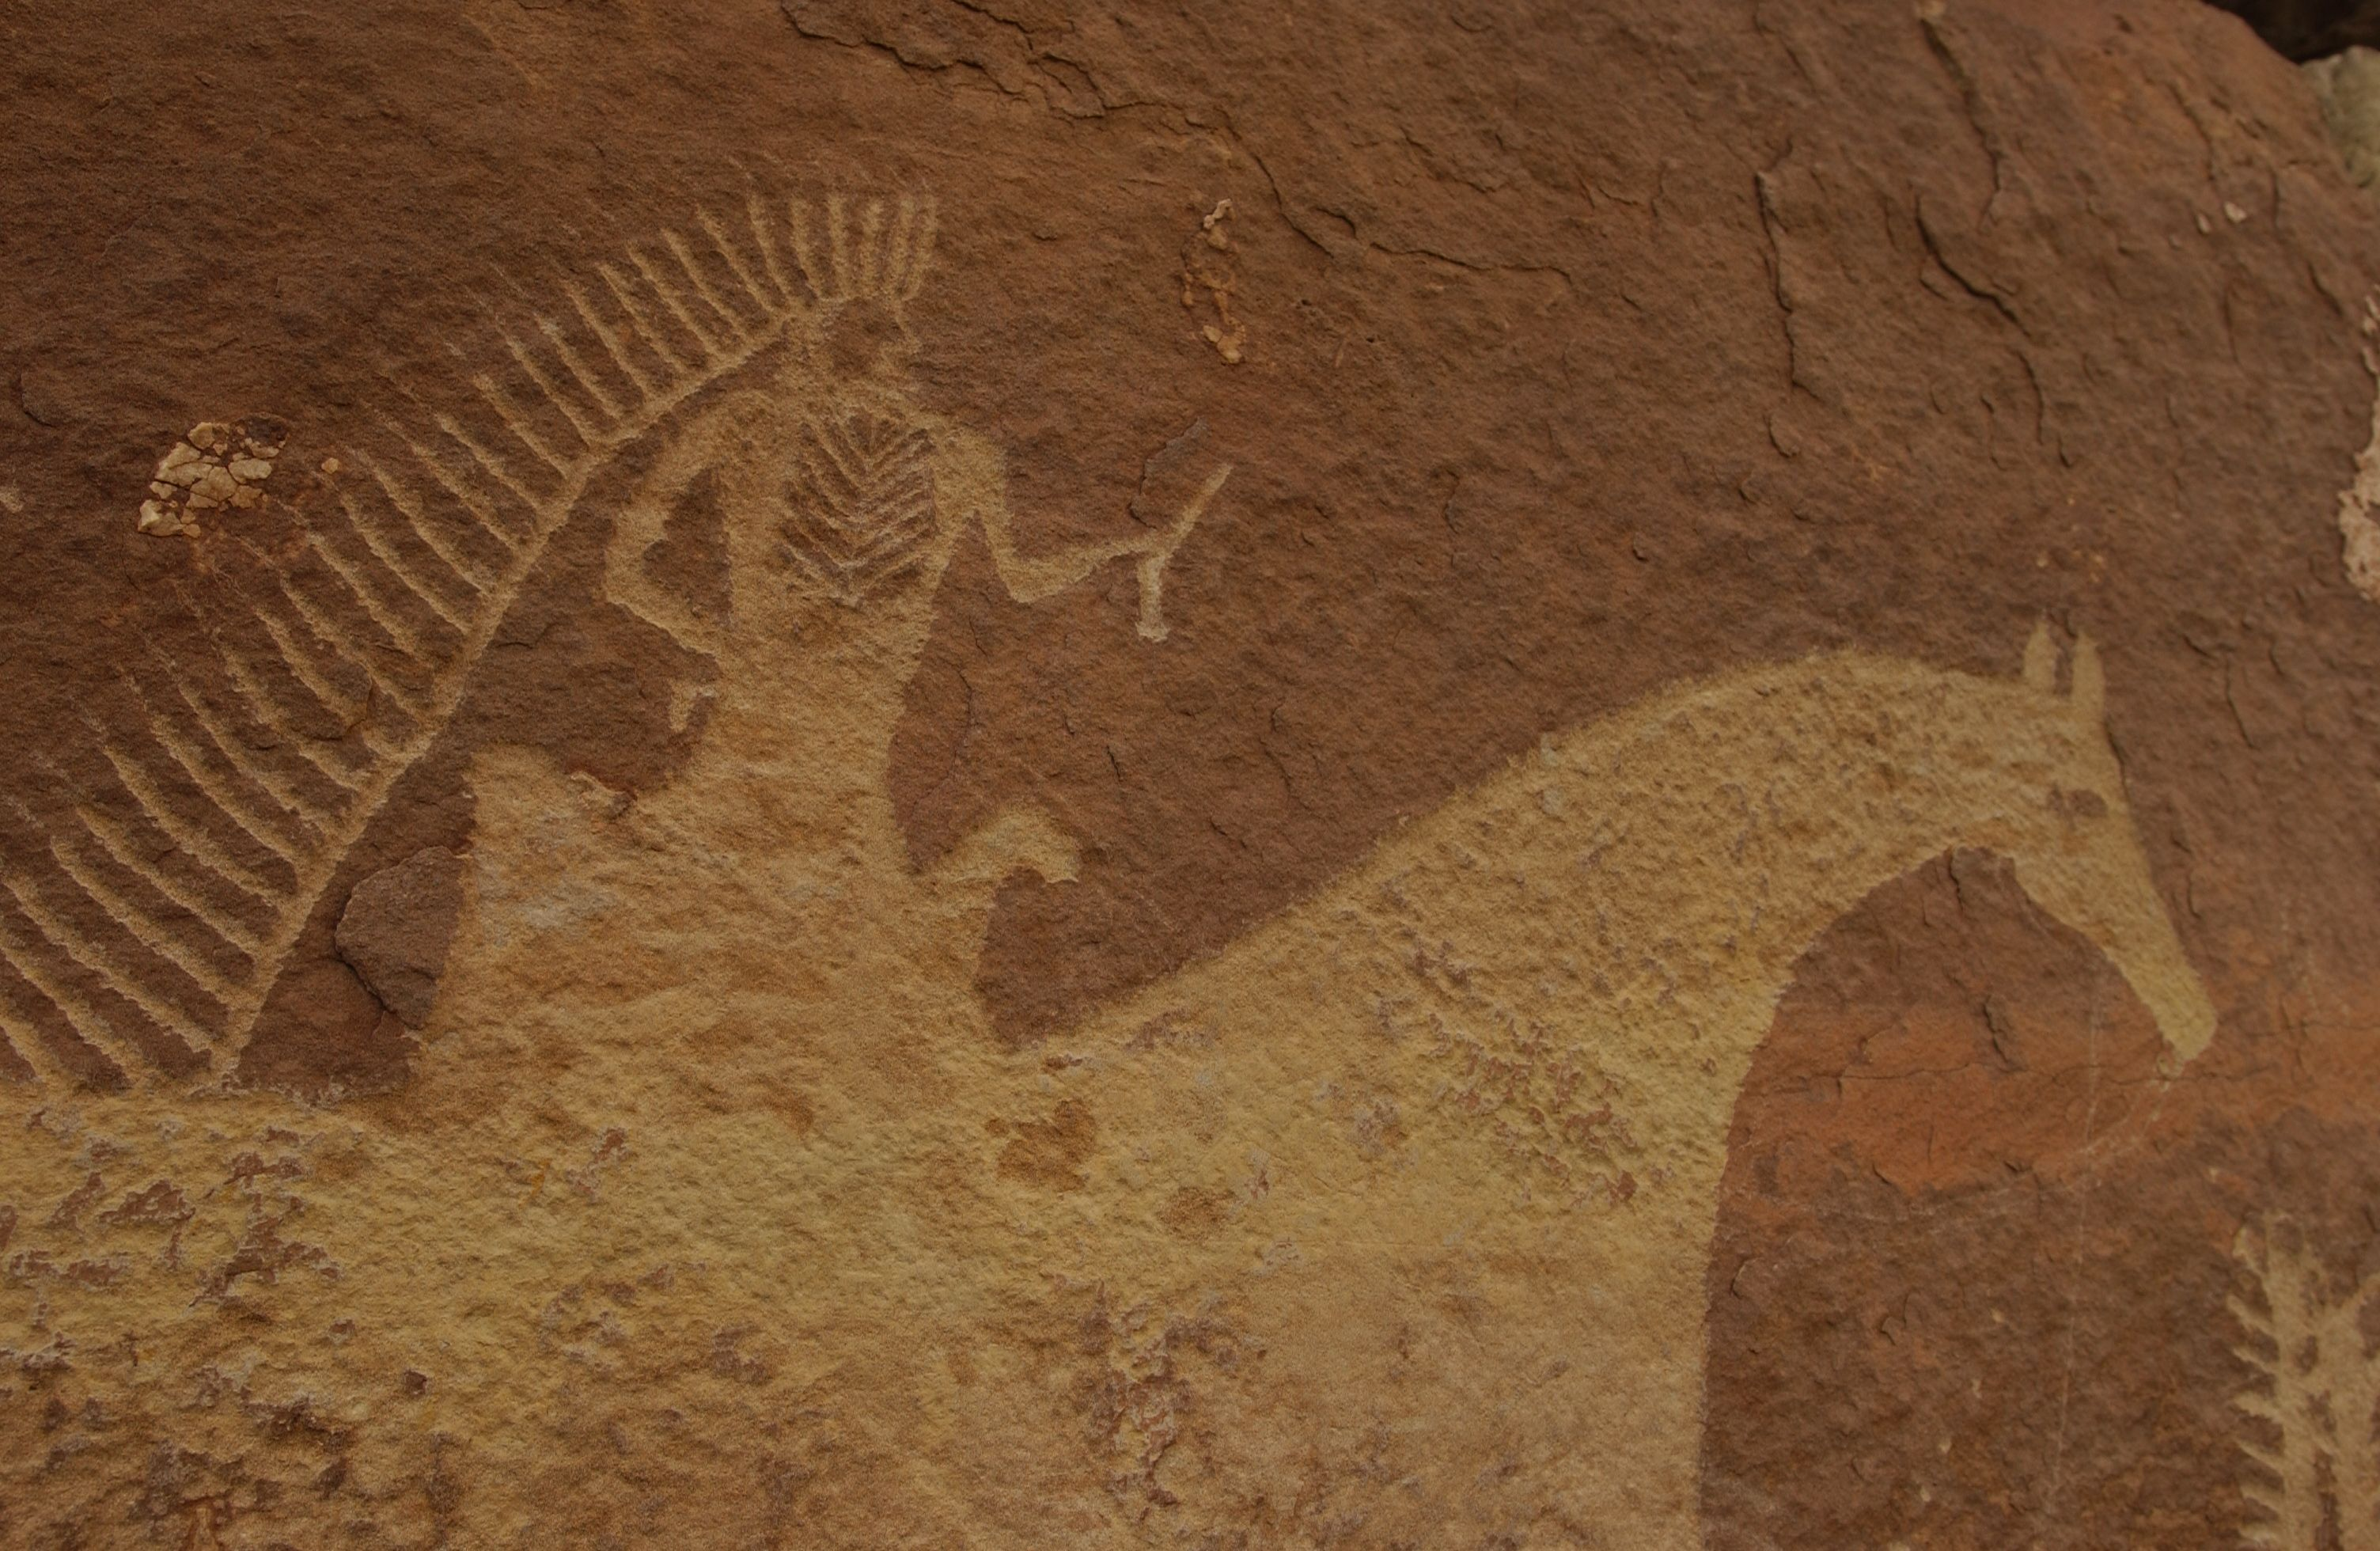 Desolation Canyon petroglyphs